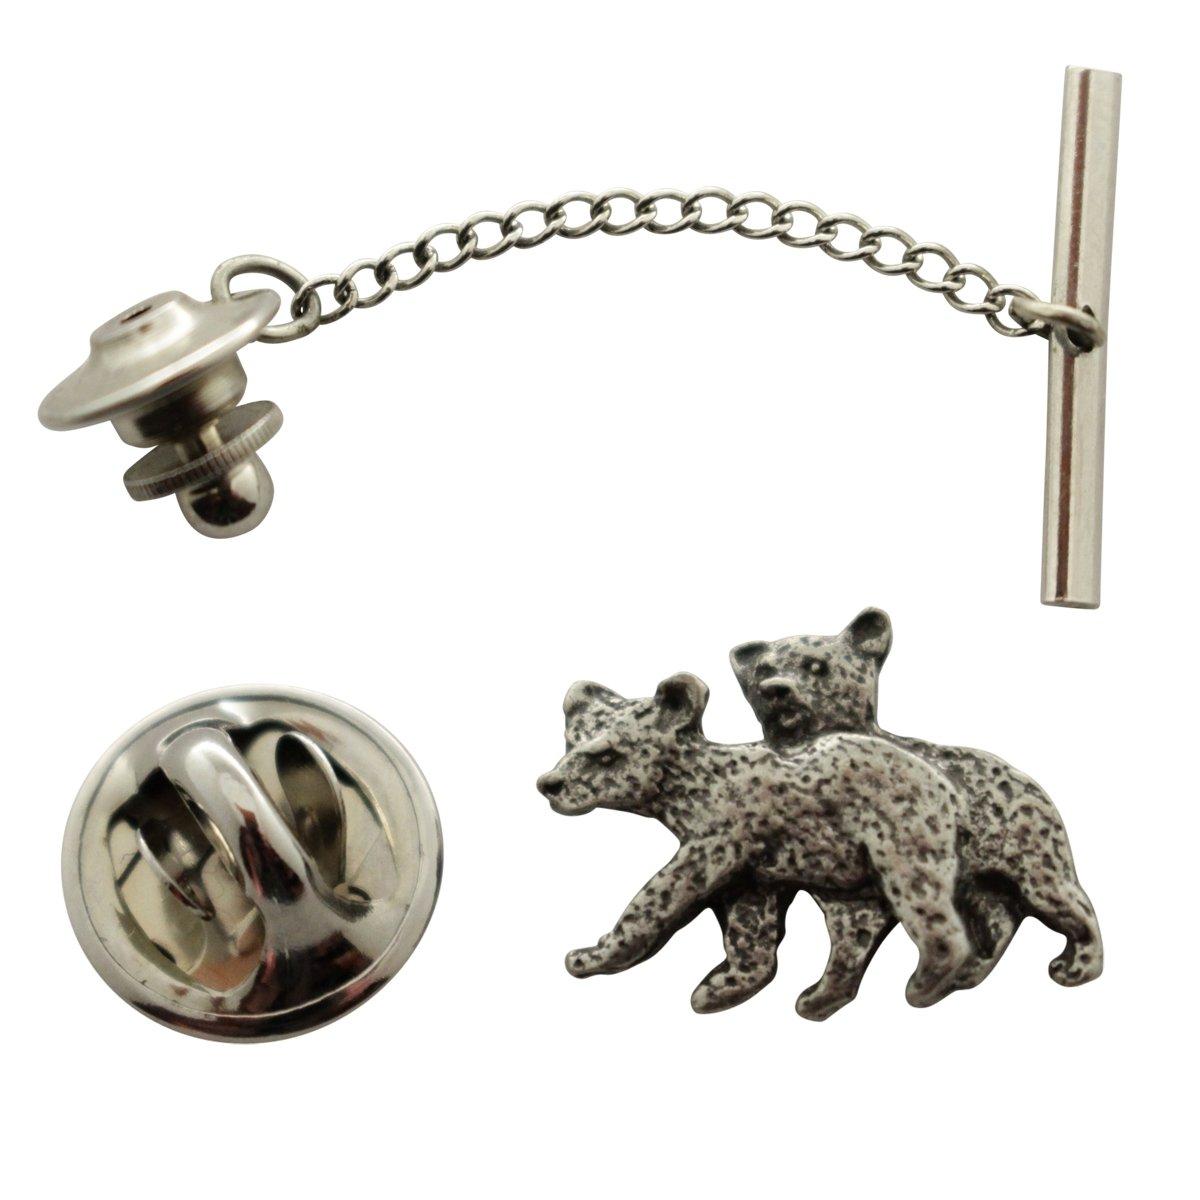 Twin Bear Cub Tie Tack ~ Antiqued Pewter ~ Tie Tack or Pin ~ Sarah's Treats & Treasures by Sarah's Treats & Treasures (Image #1)